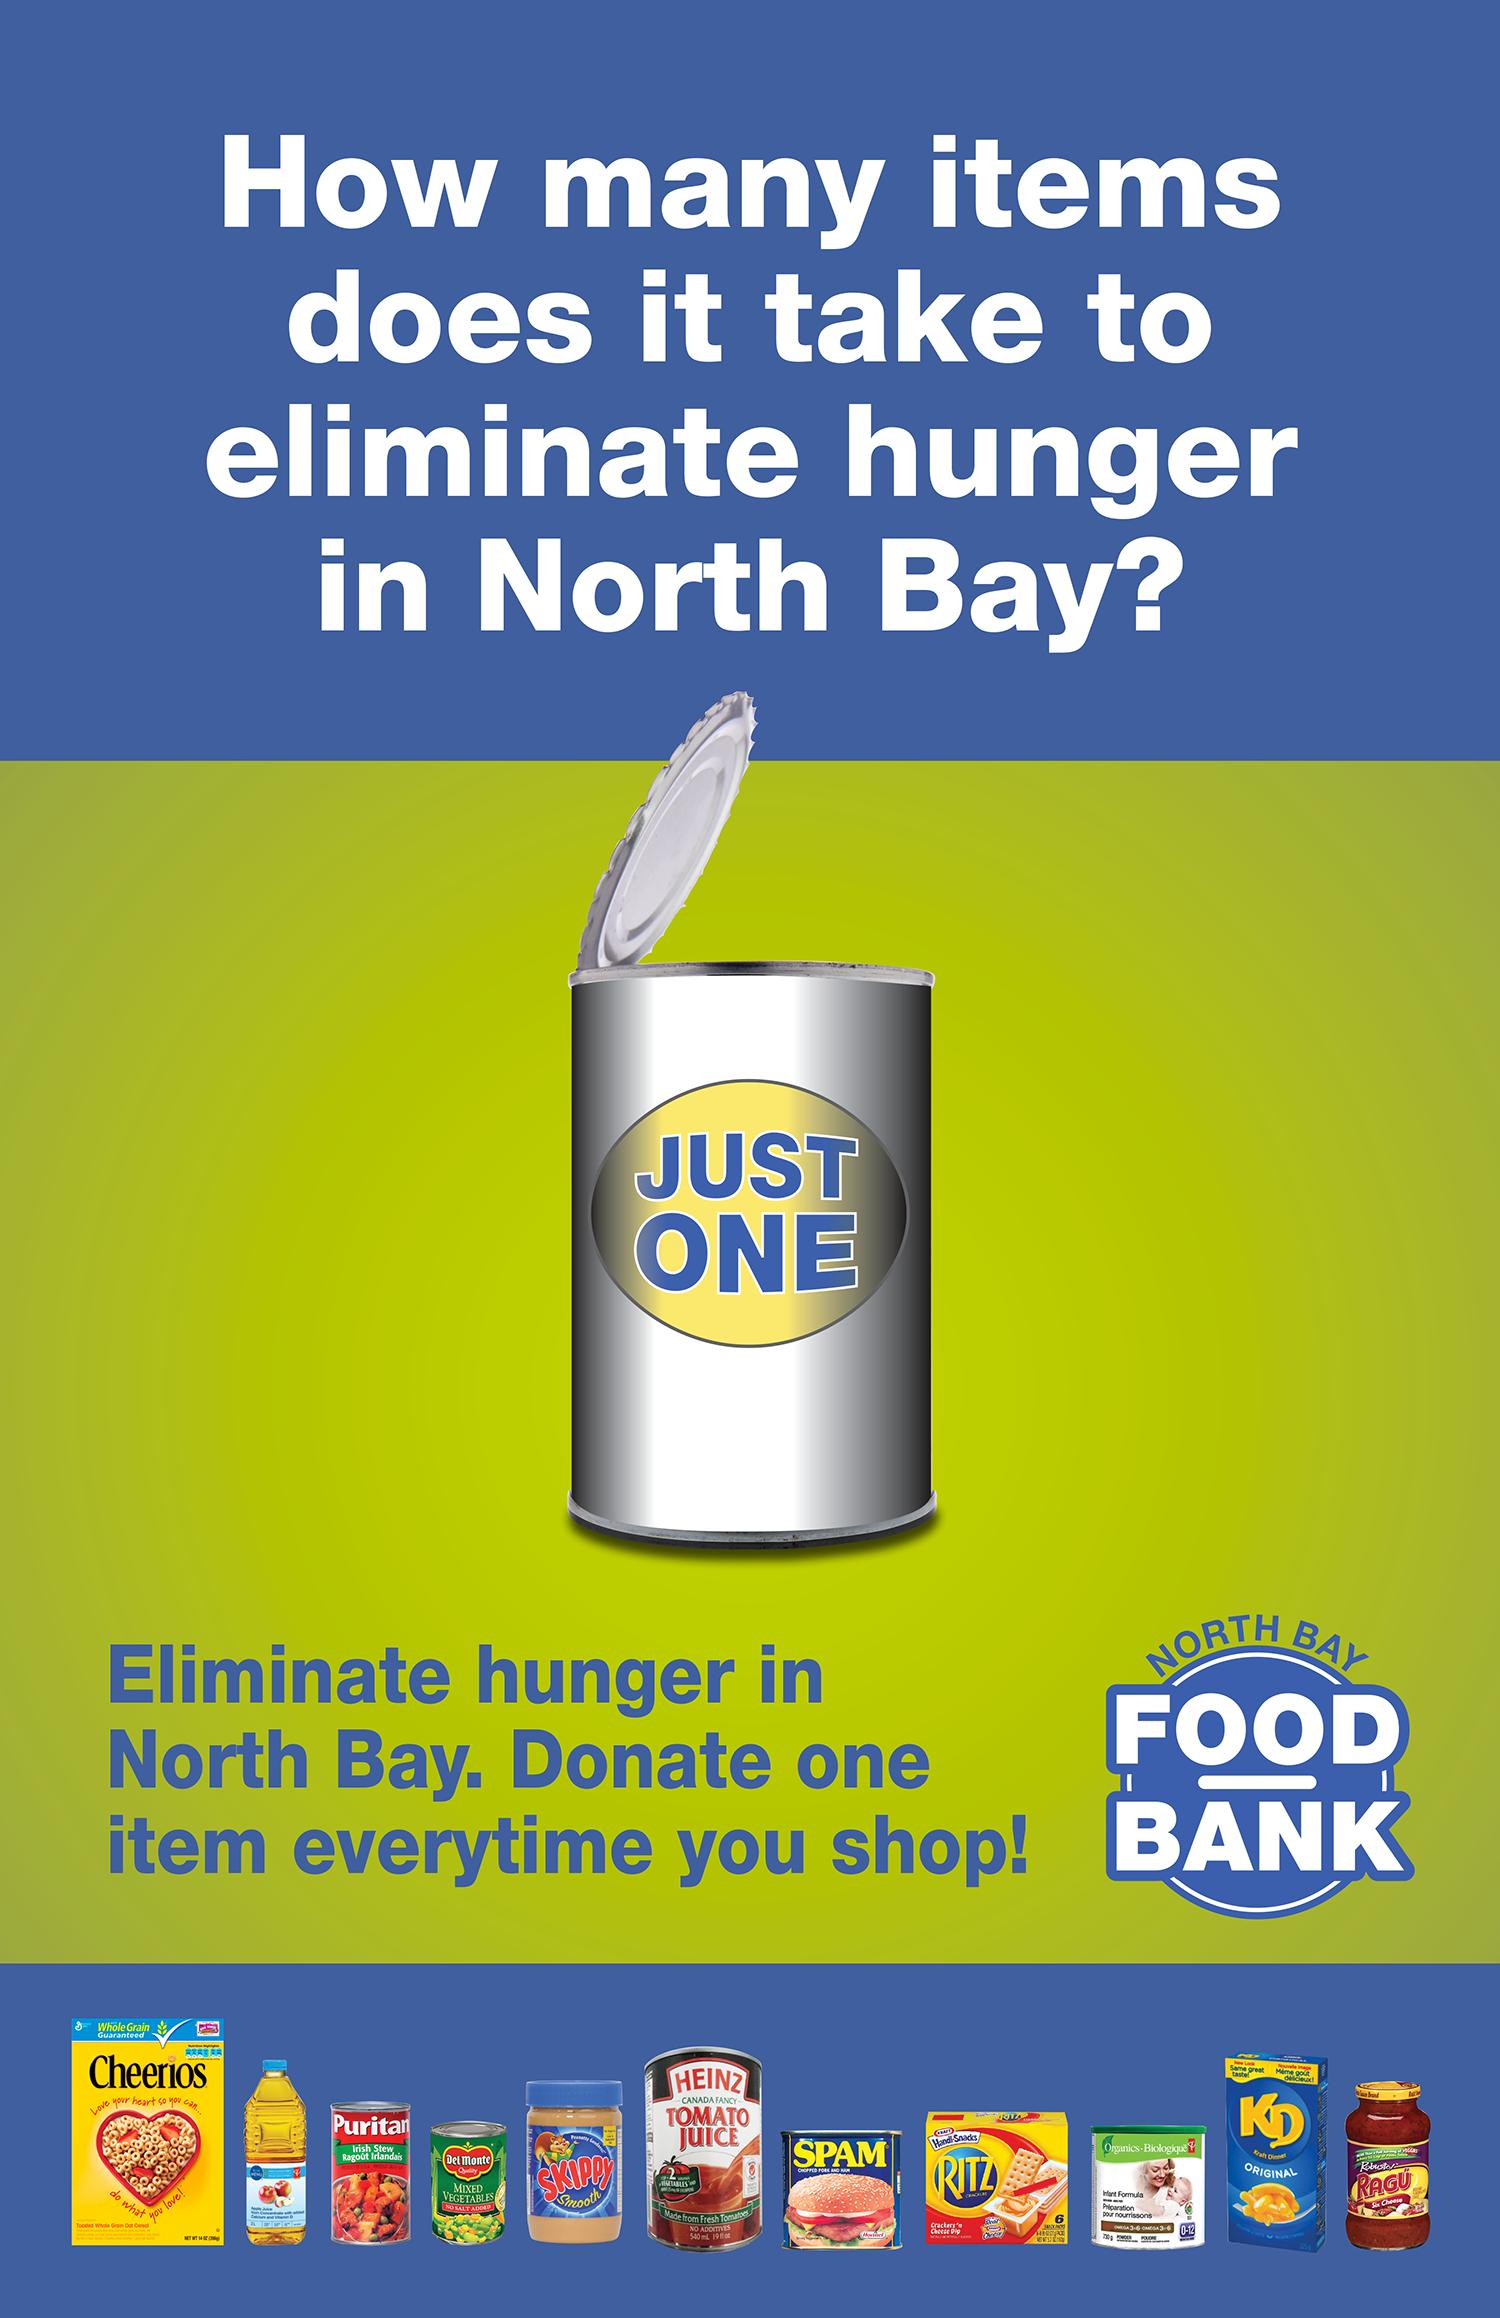 Just 1 Campaign Poster North Bay Food Bank